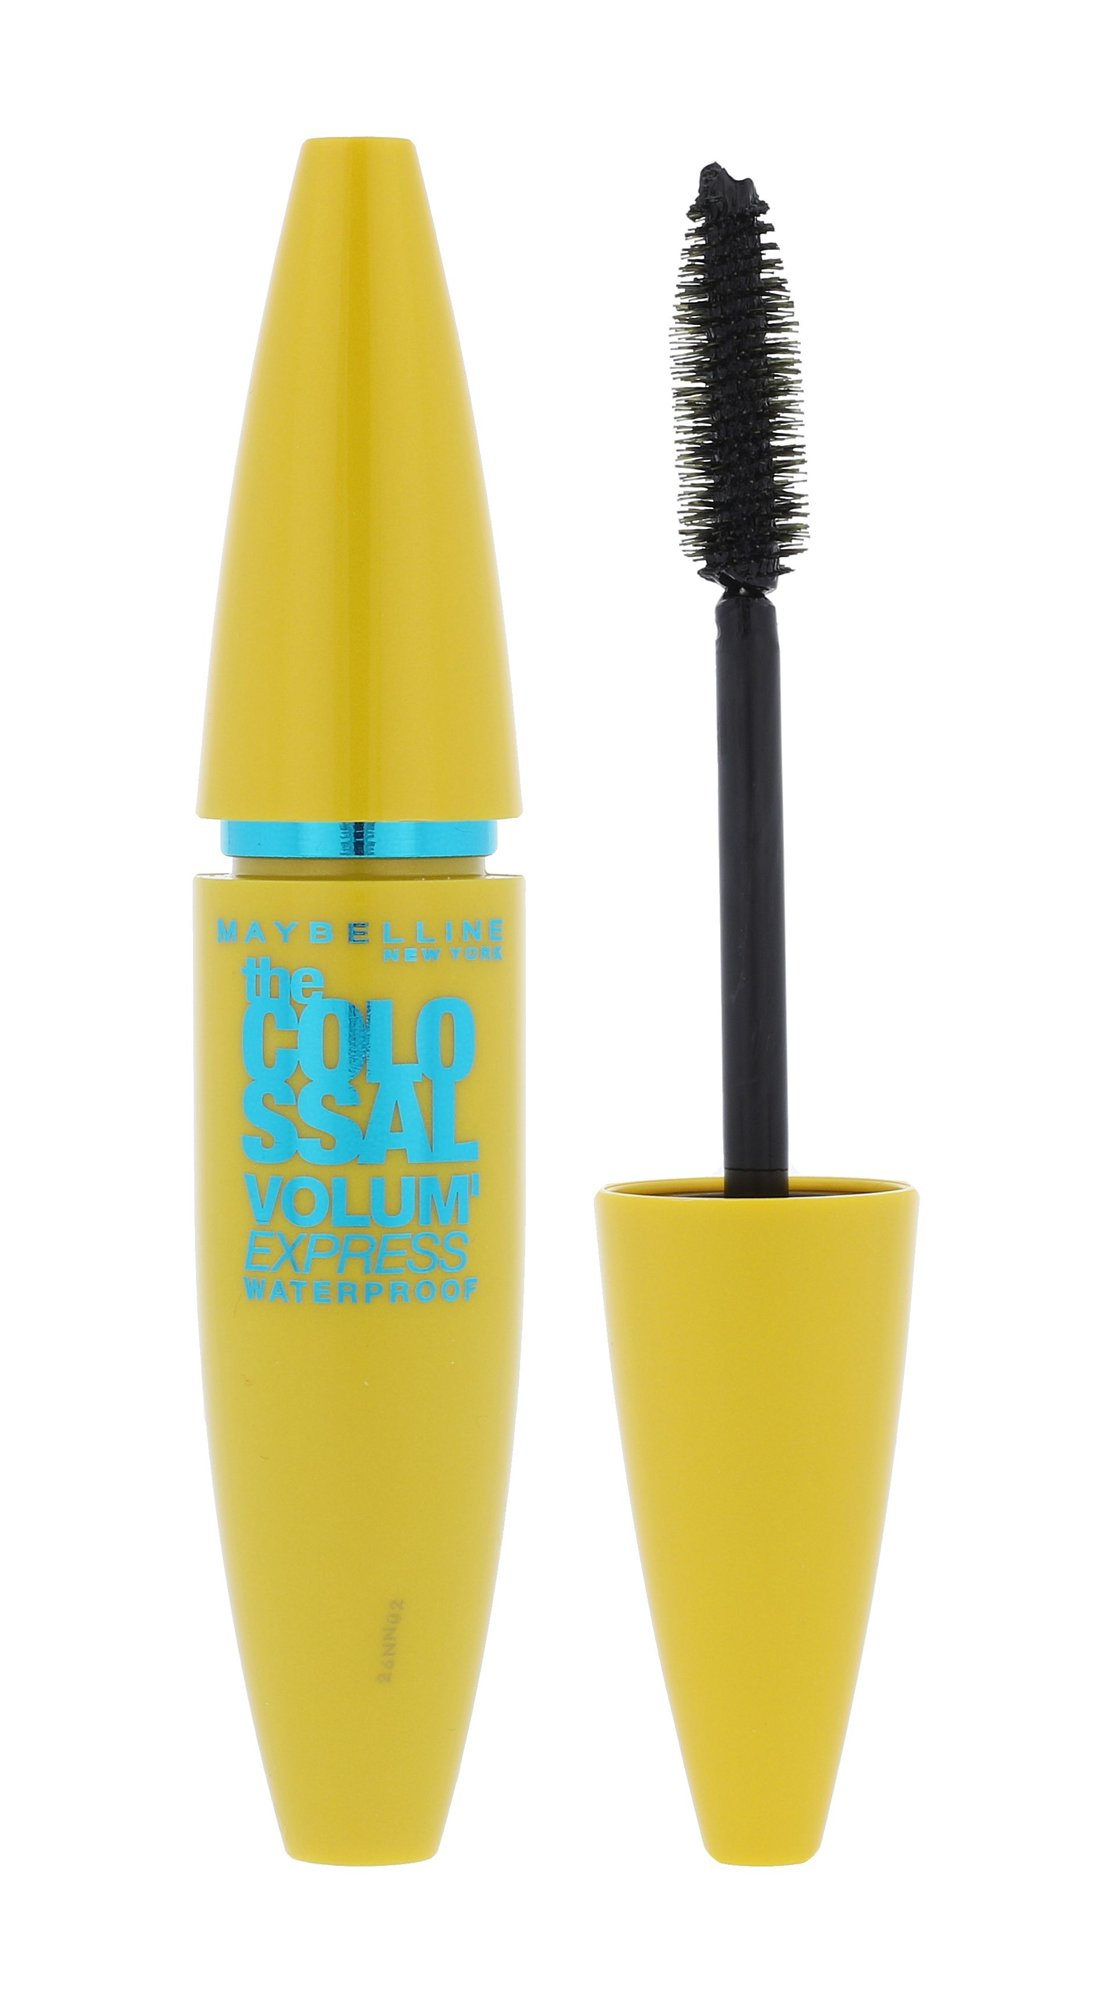 Maybelline Mascara Colossal Volum Waterproof Black